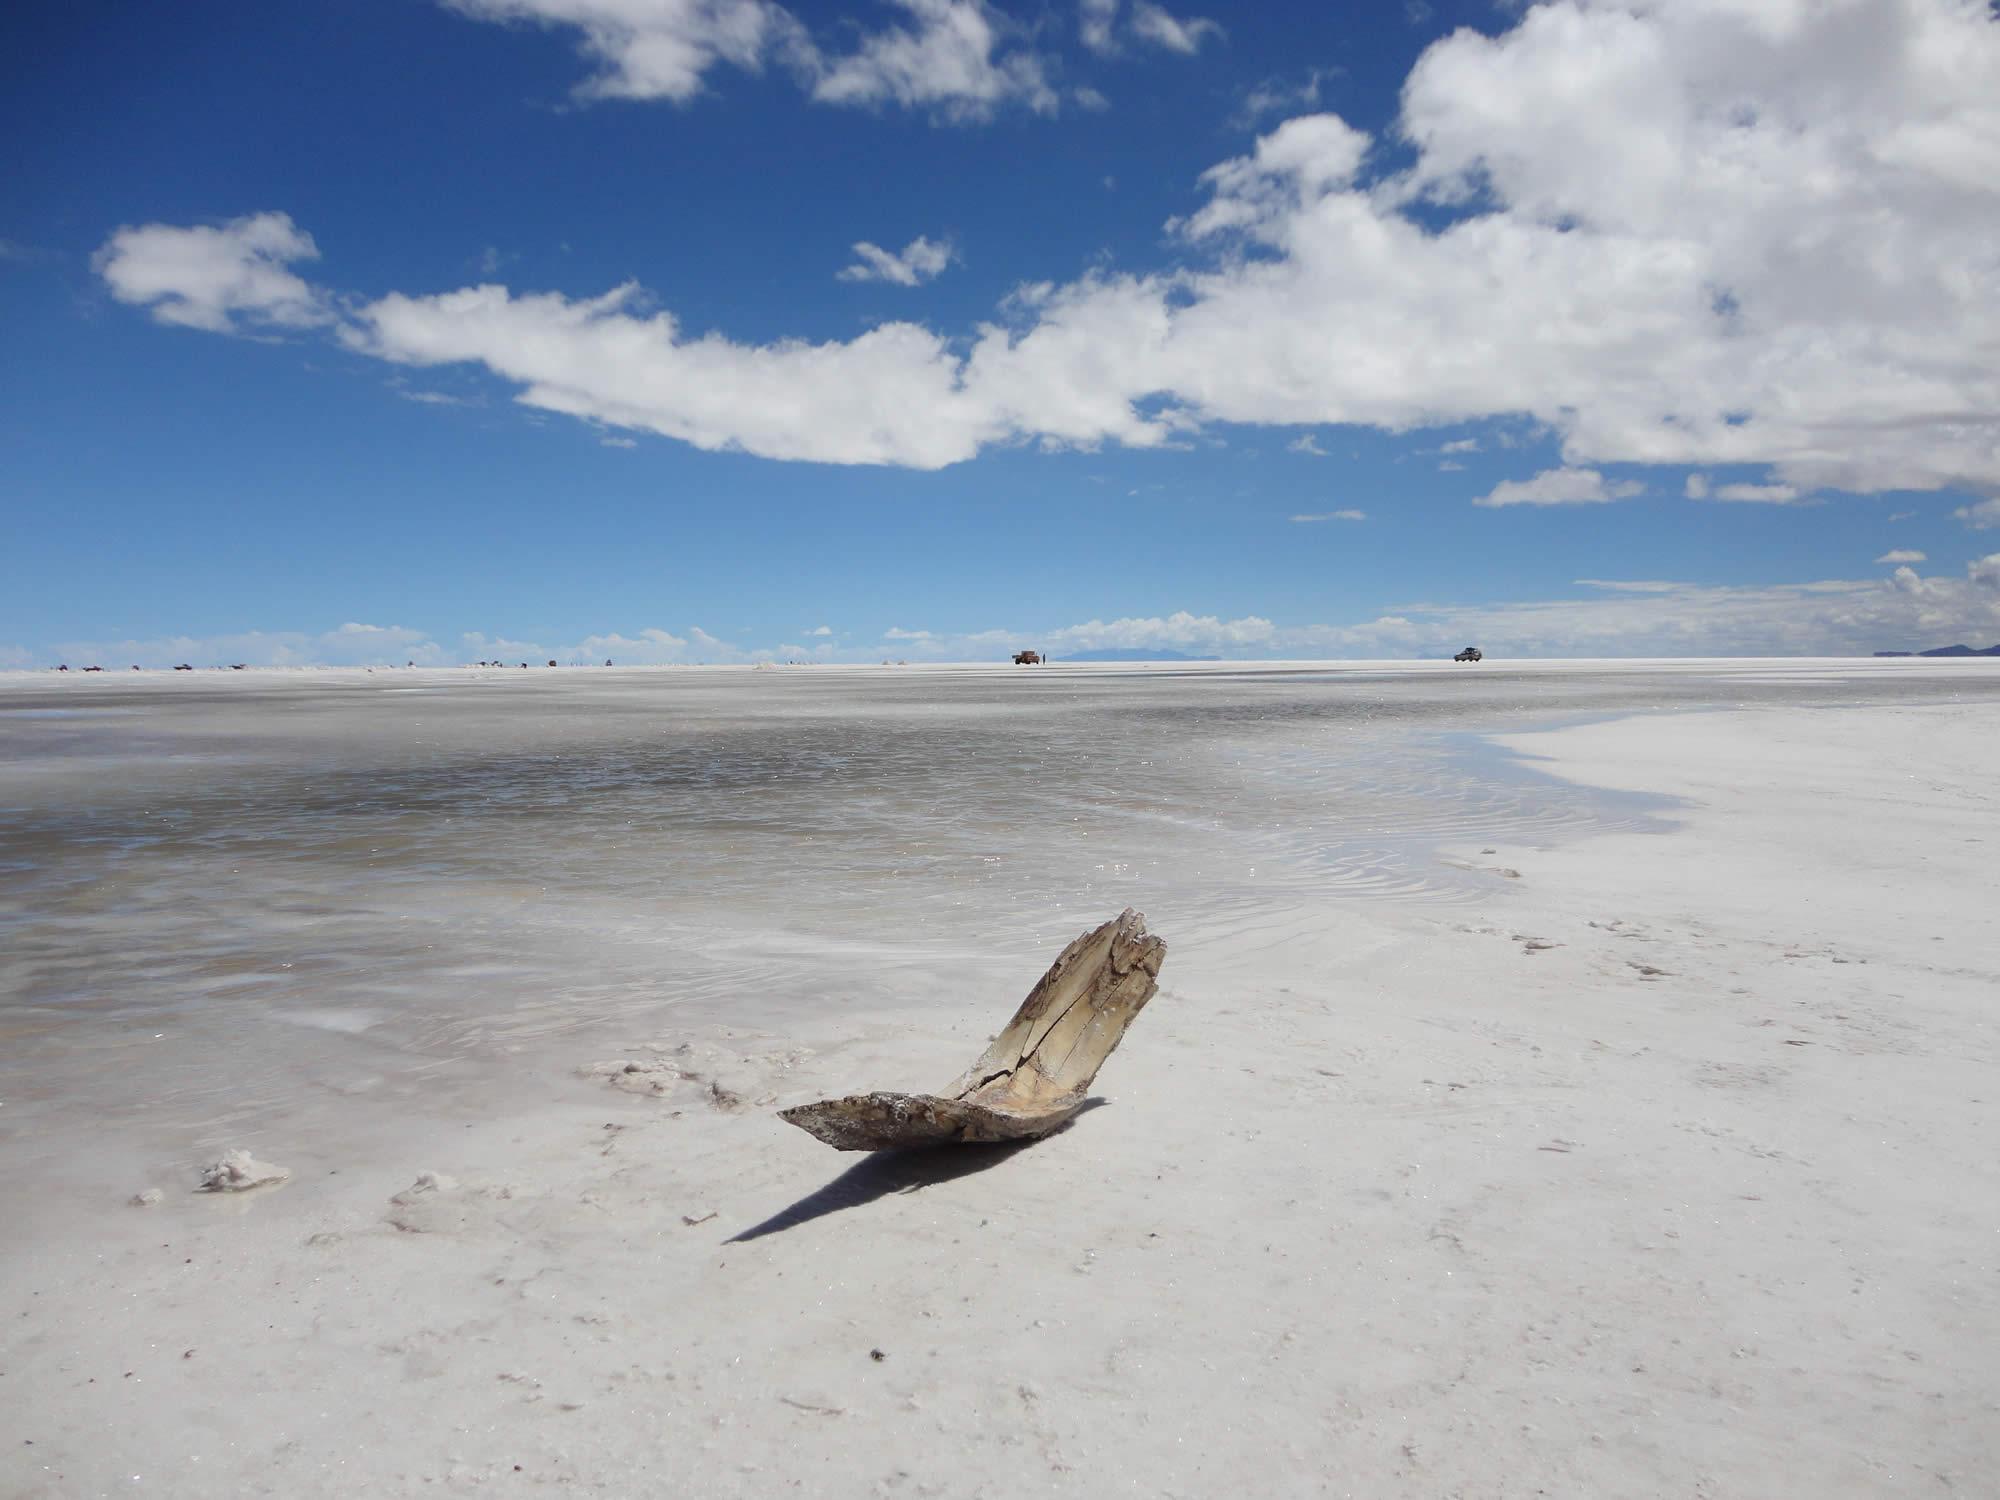 La Paz - Uyuni Salt Flat - La Paz Shared Tour by Plane, Uyuni